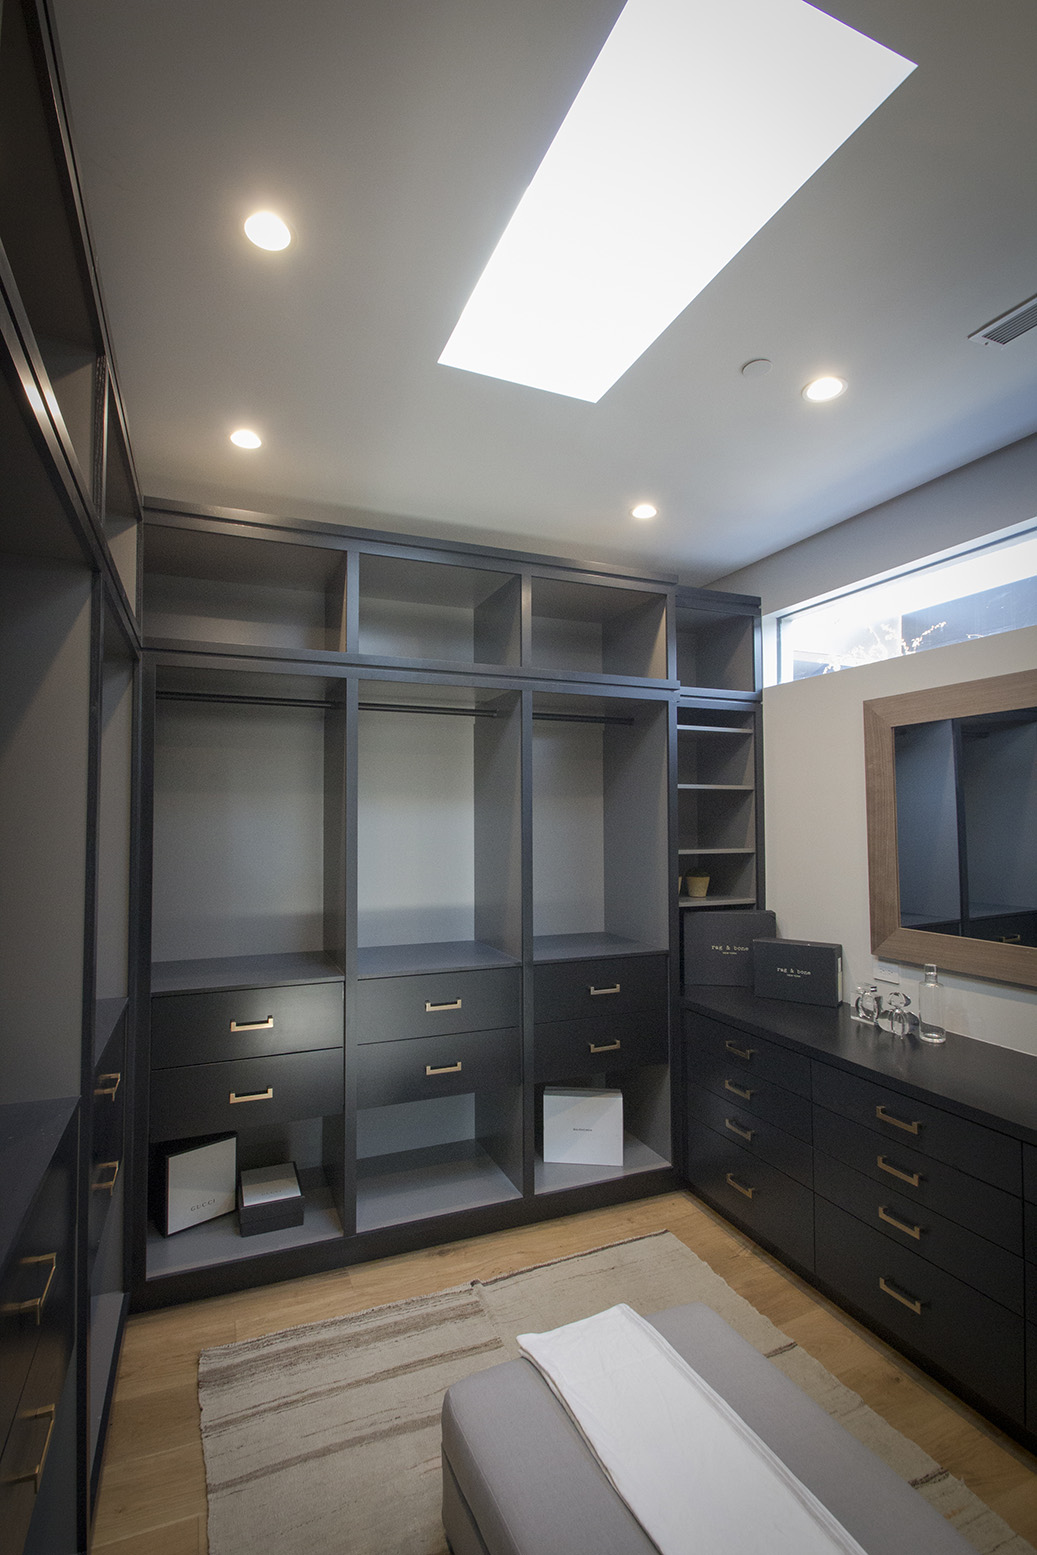 Maryland Drive House - Closet room 2